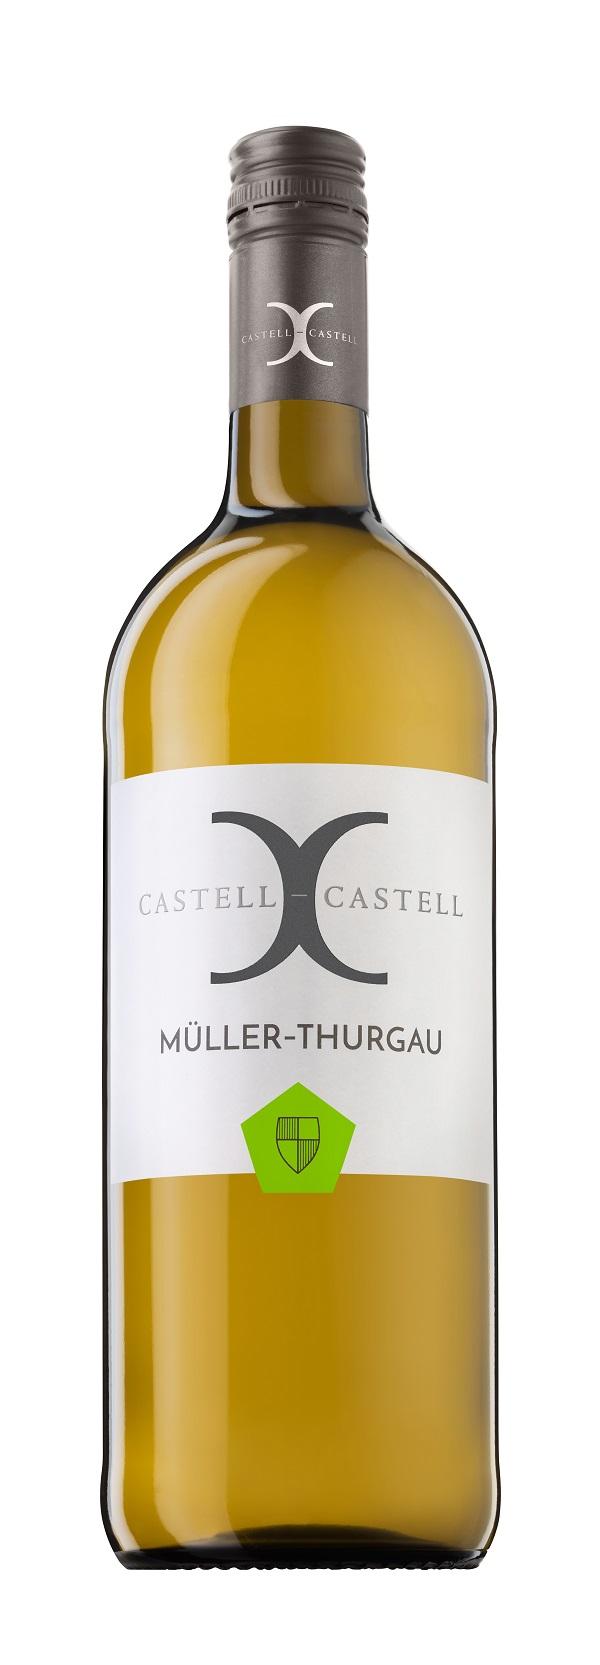 CASTELL-CASTELL Müller-Thurgau trocken 2020